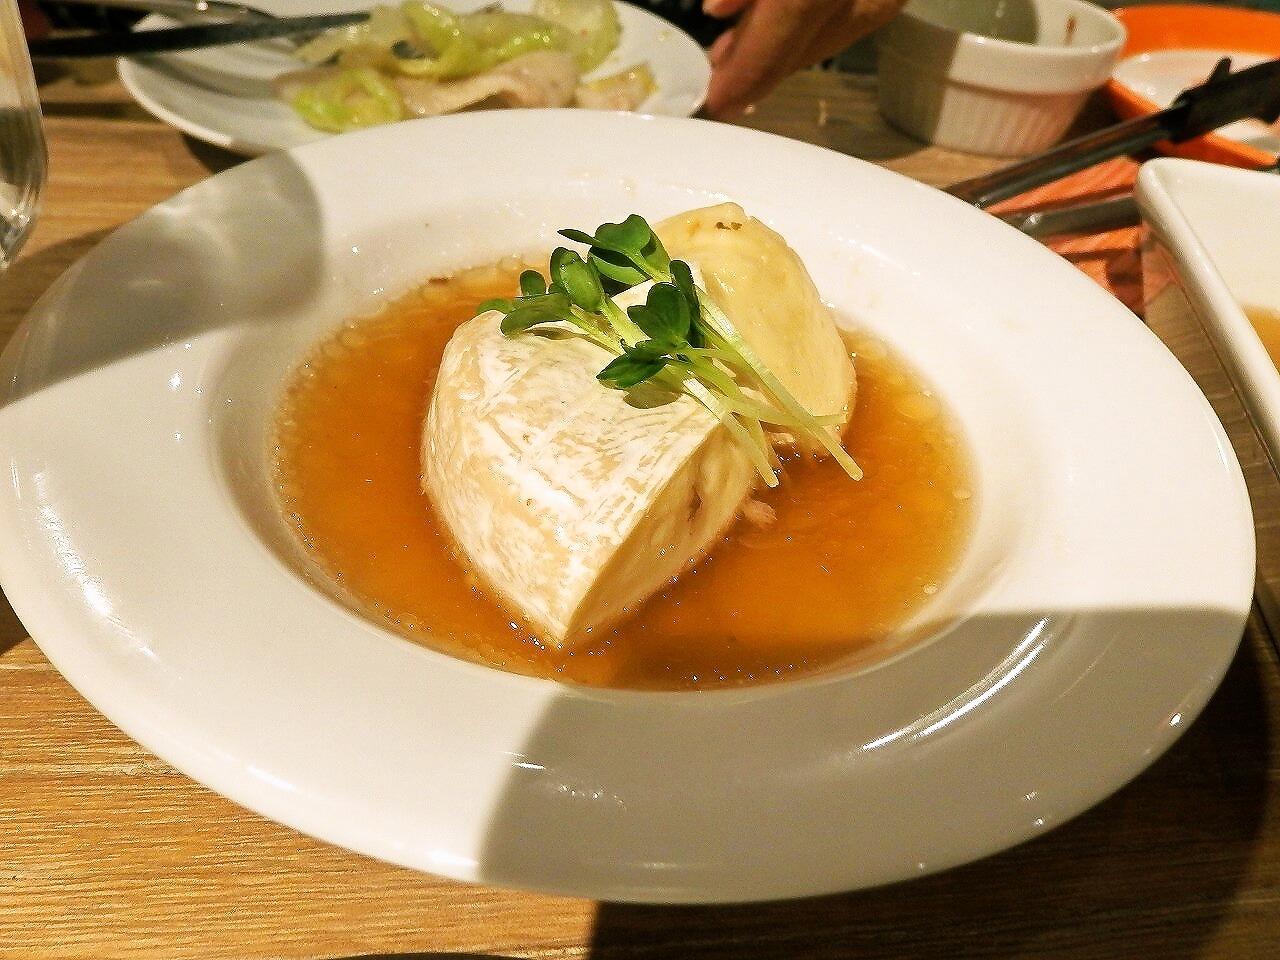 s-foodpic7207483.jpg